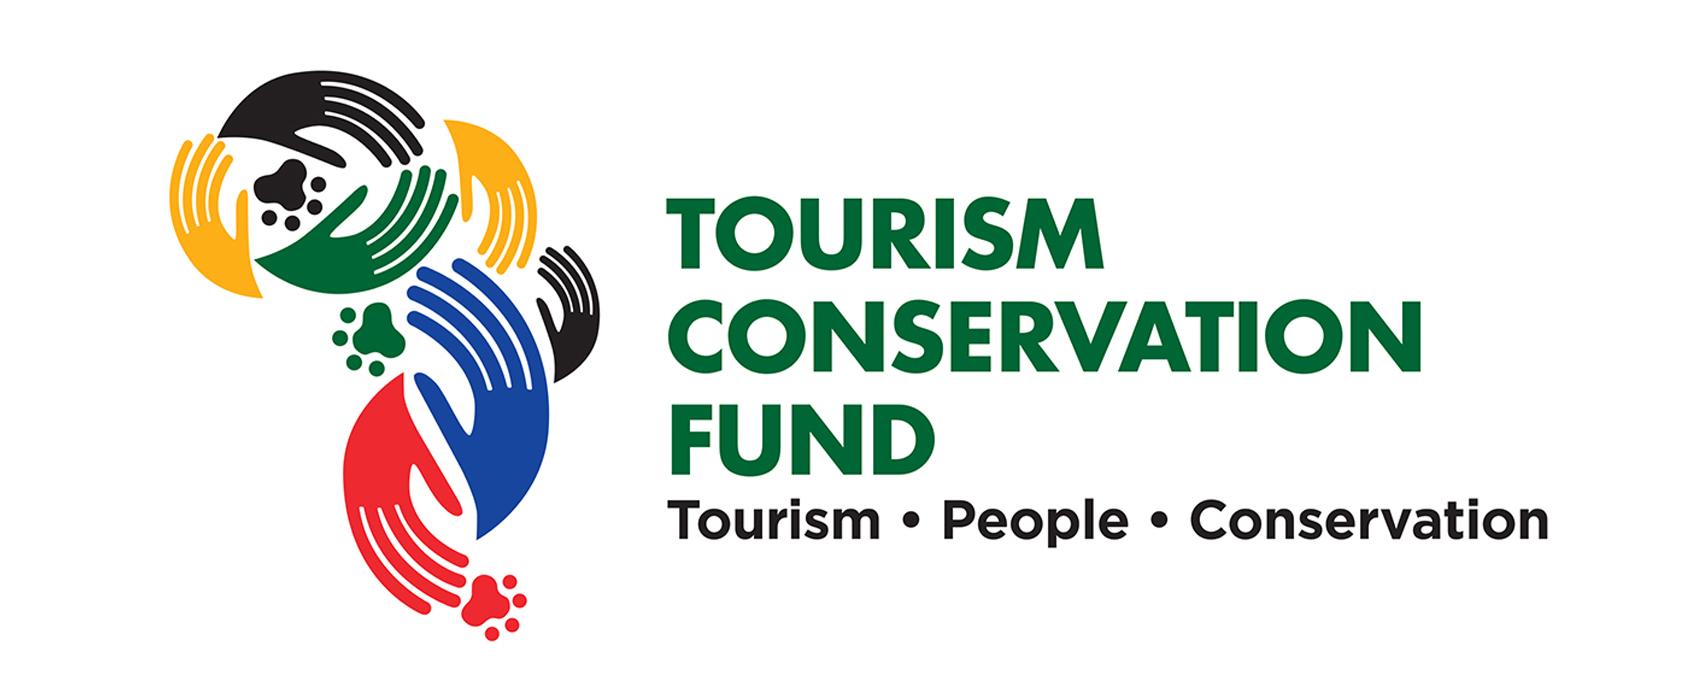 Tourism_Conservation_Fund